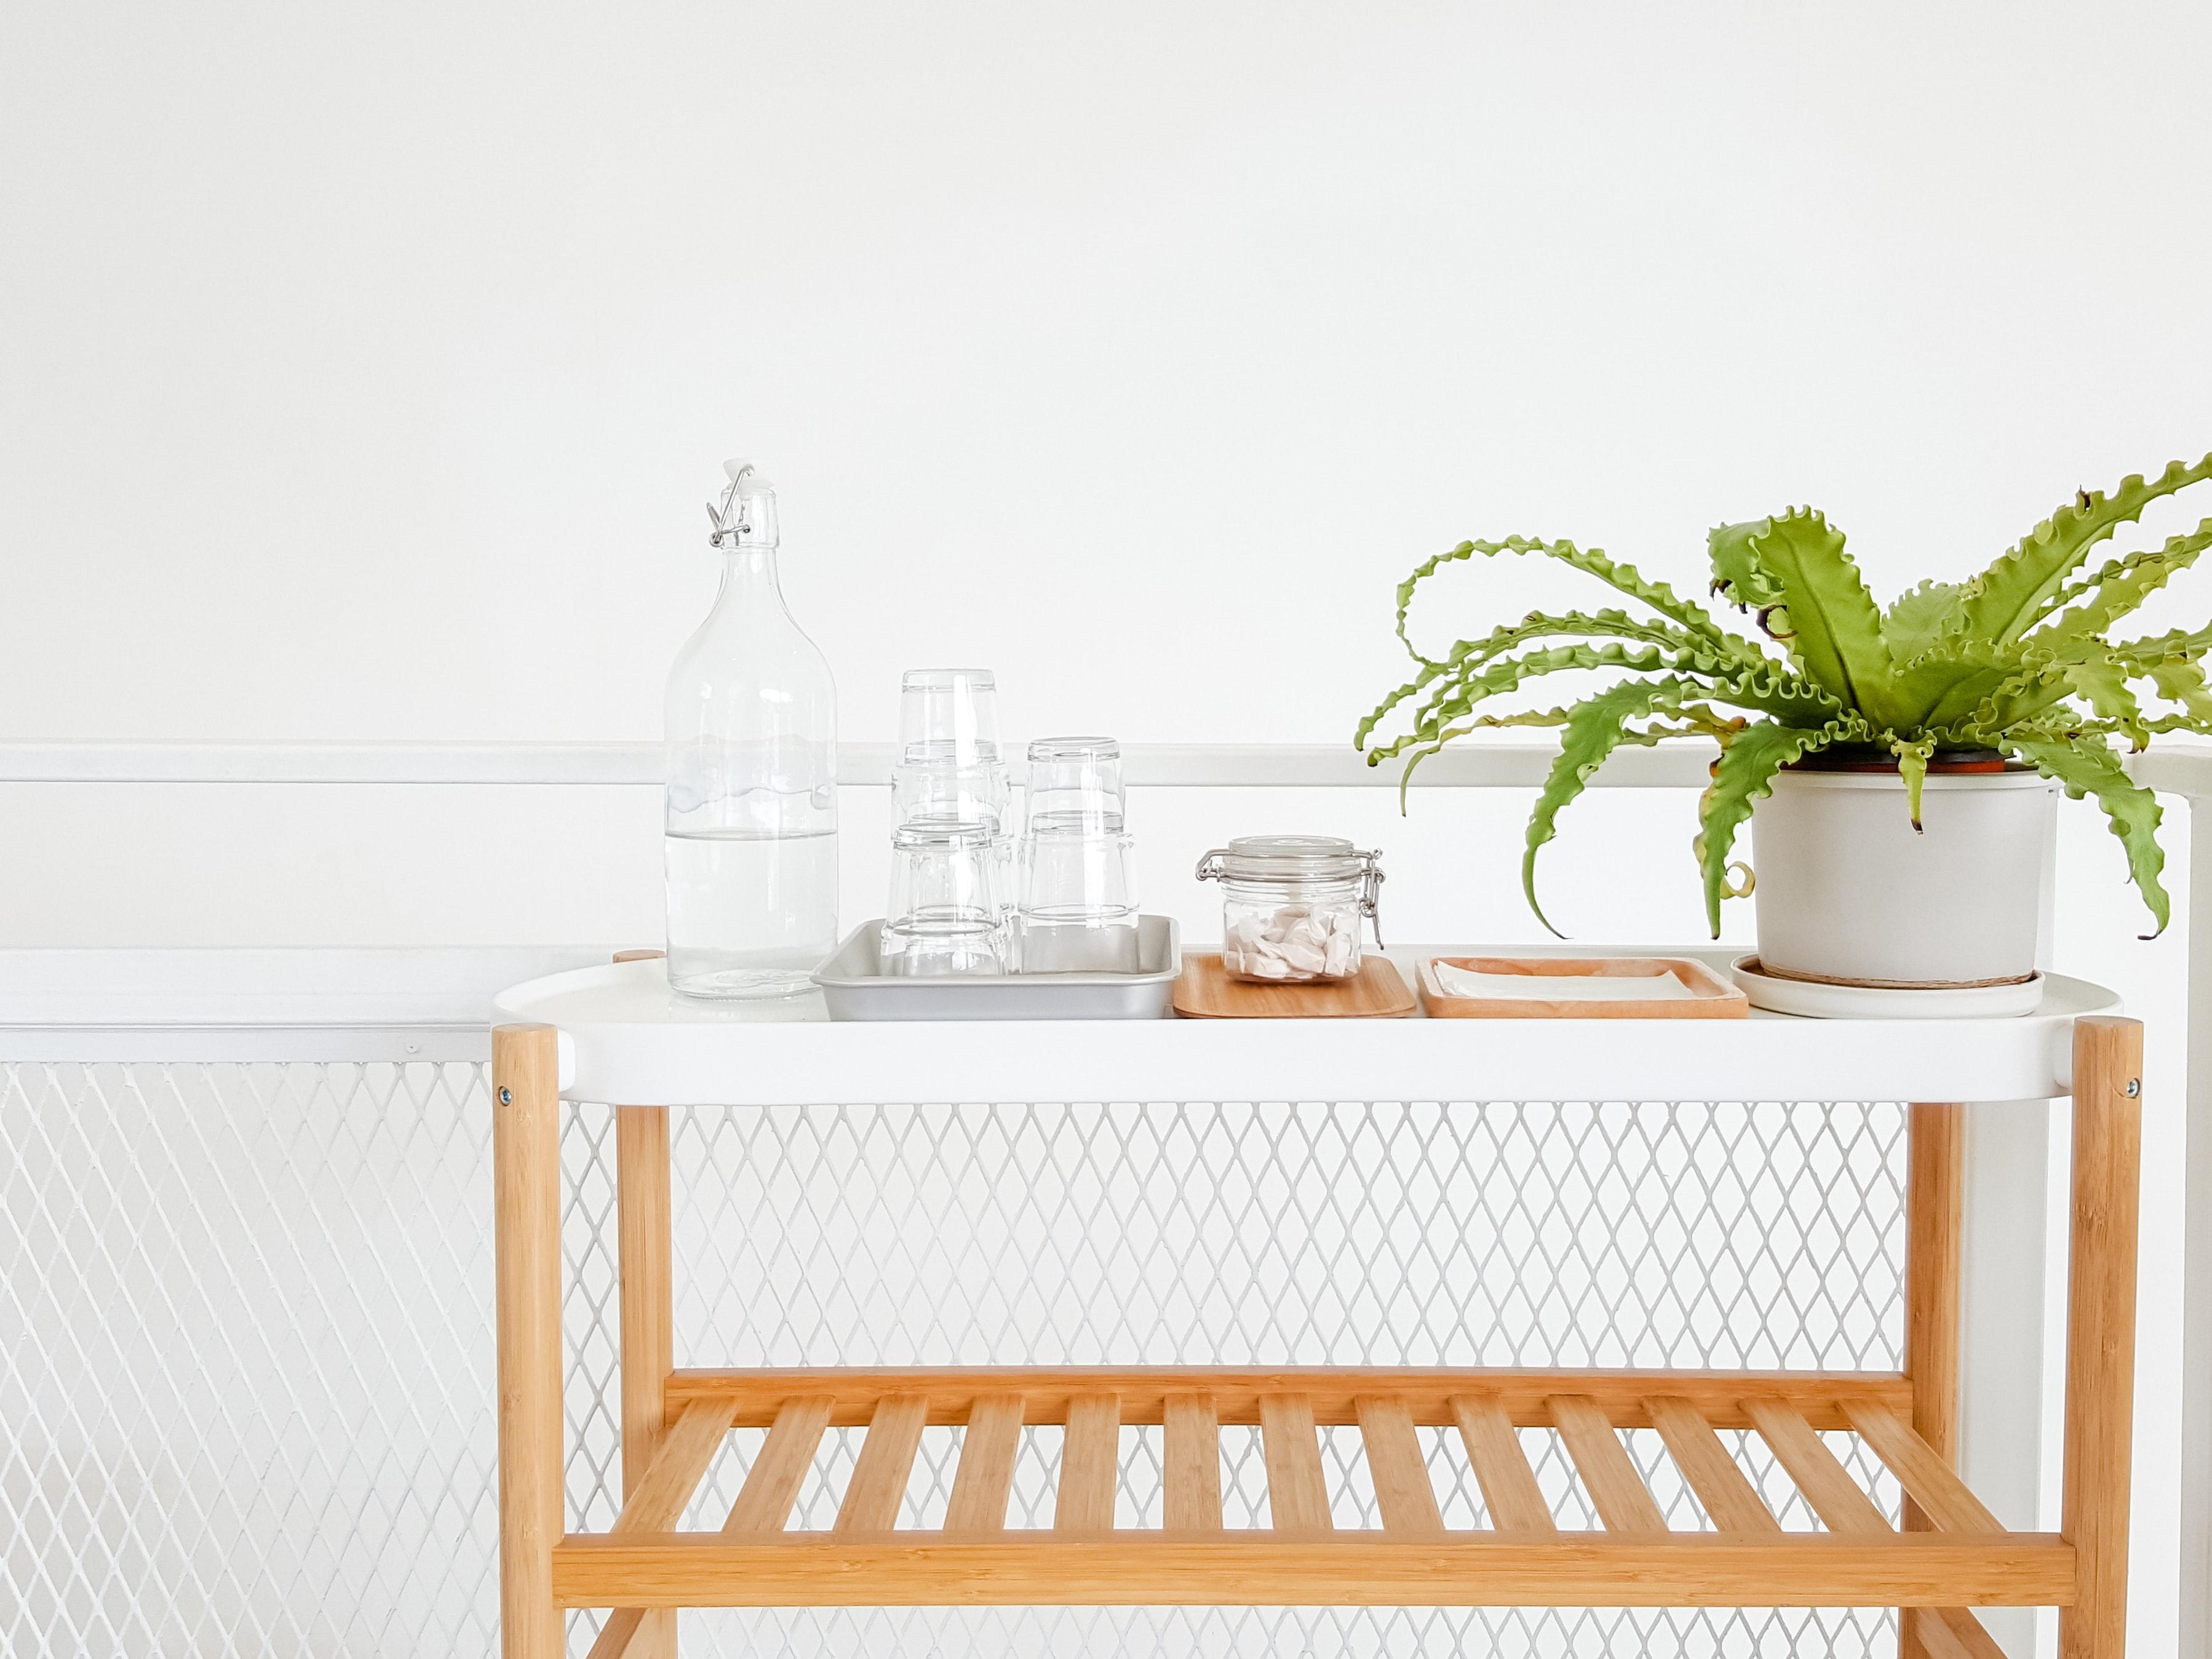 apartment-beverage-bottle-clean-544112